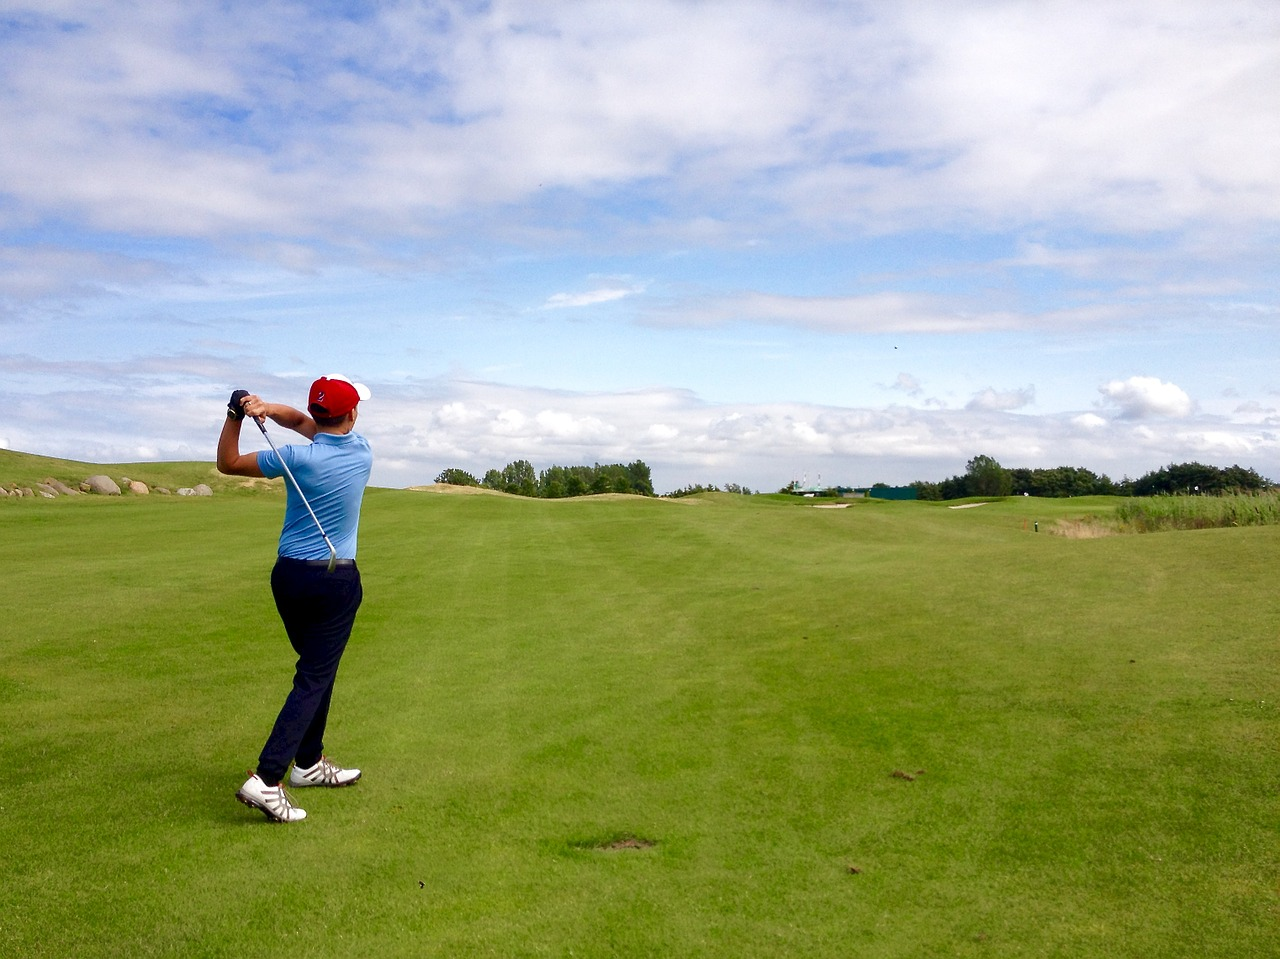 golf-858974_1280